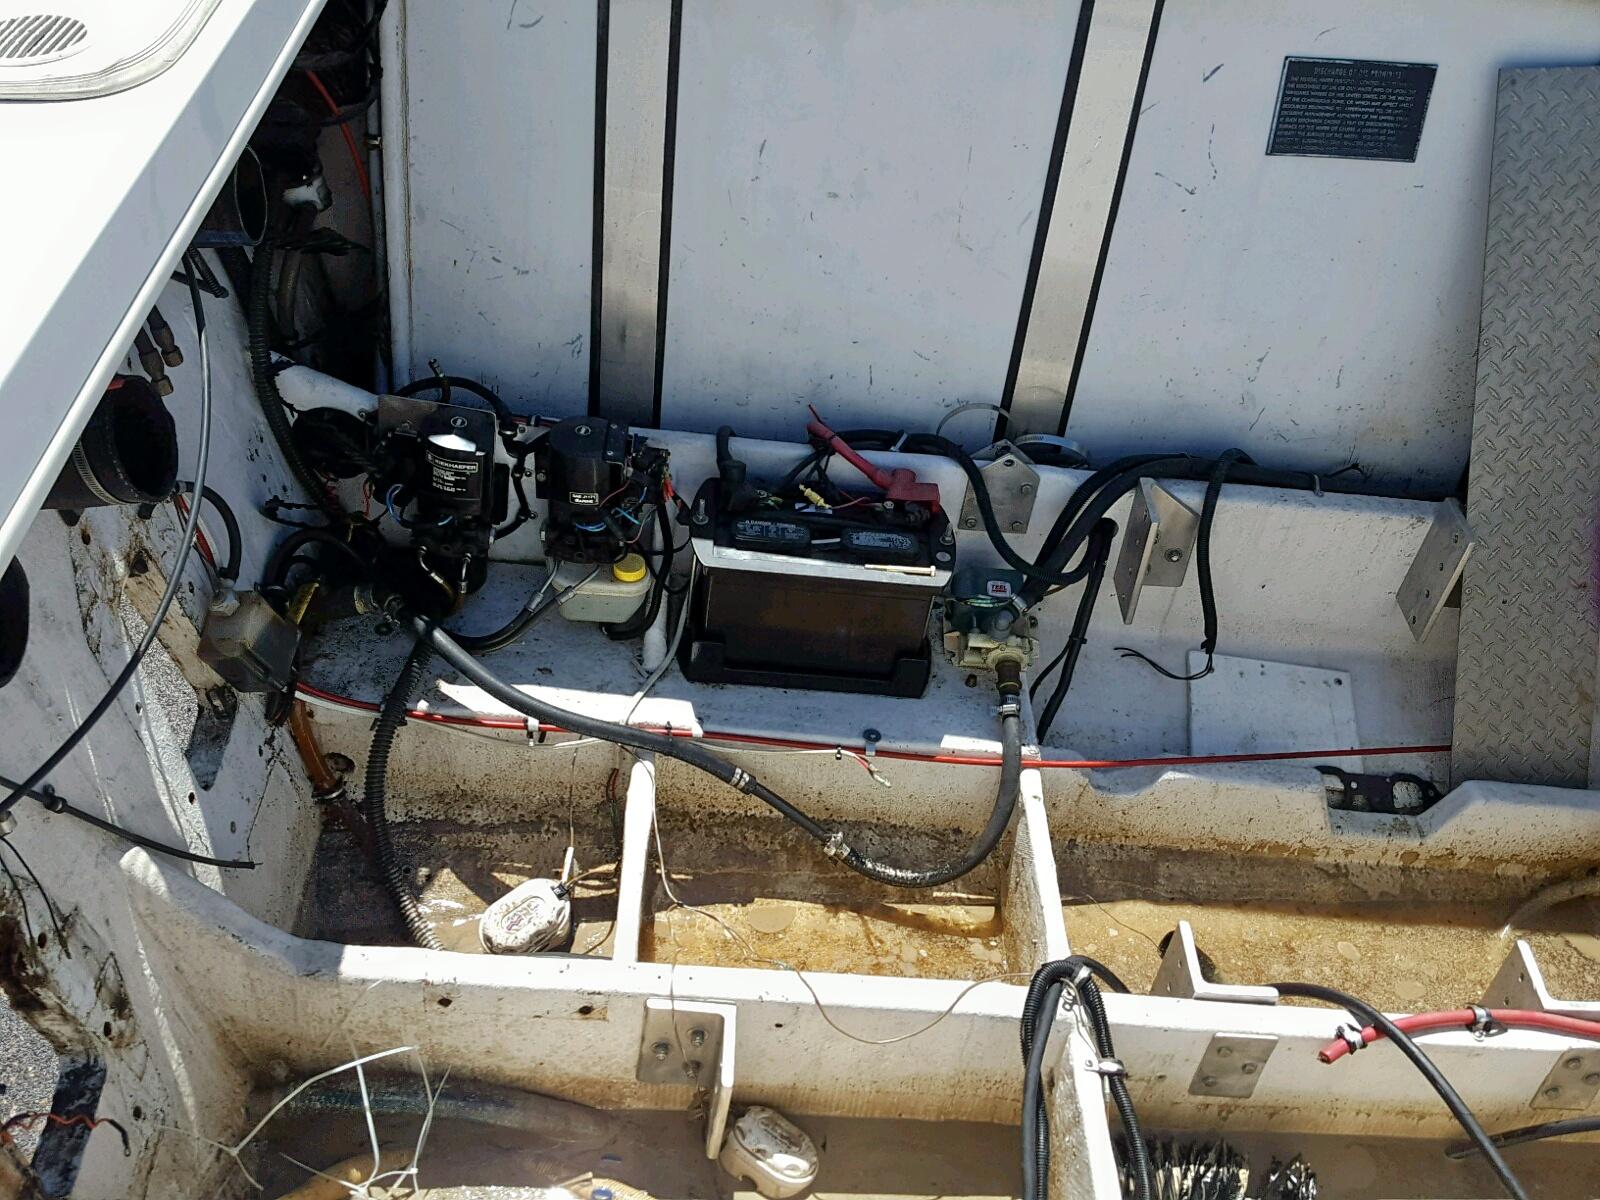 AGC71003C979 - 1997 Baja Outlaw Sst inside view